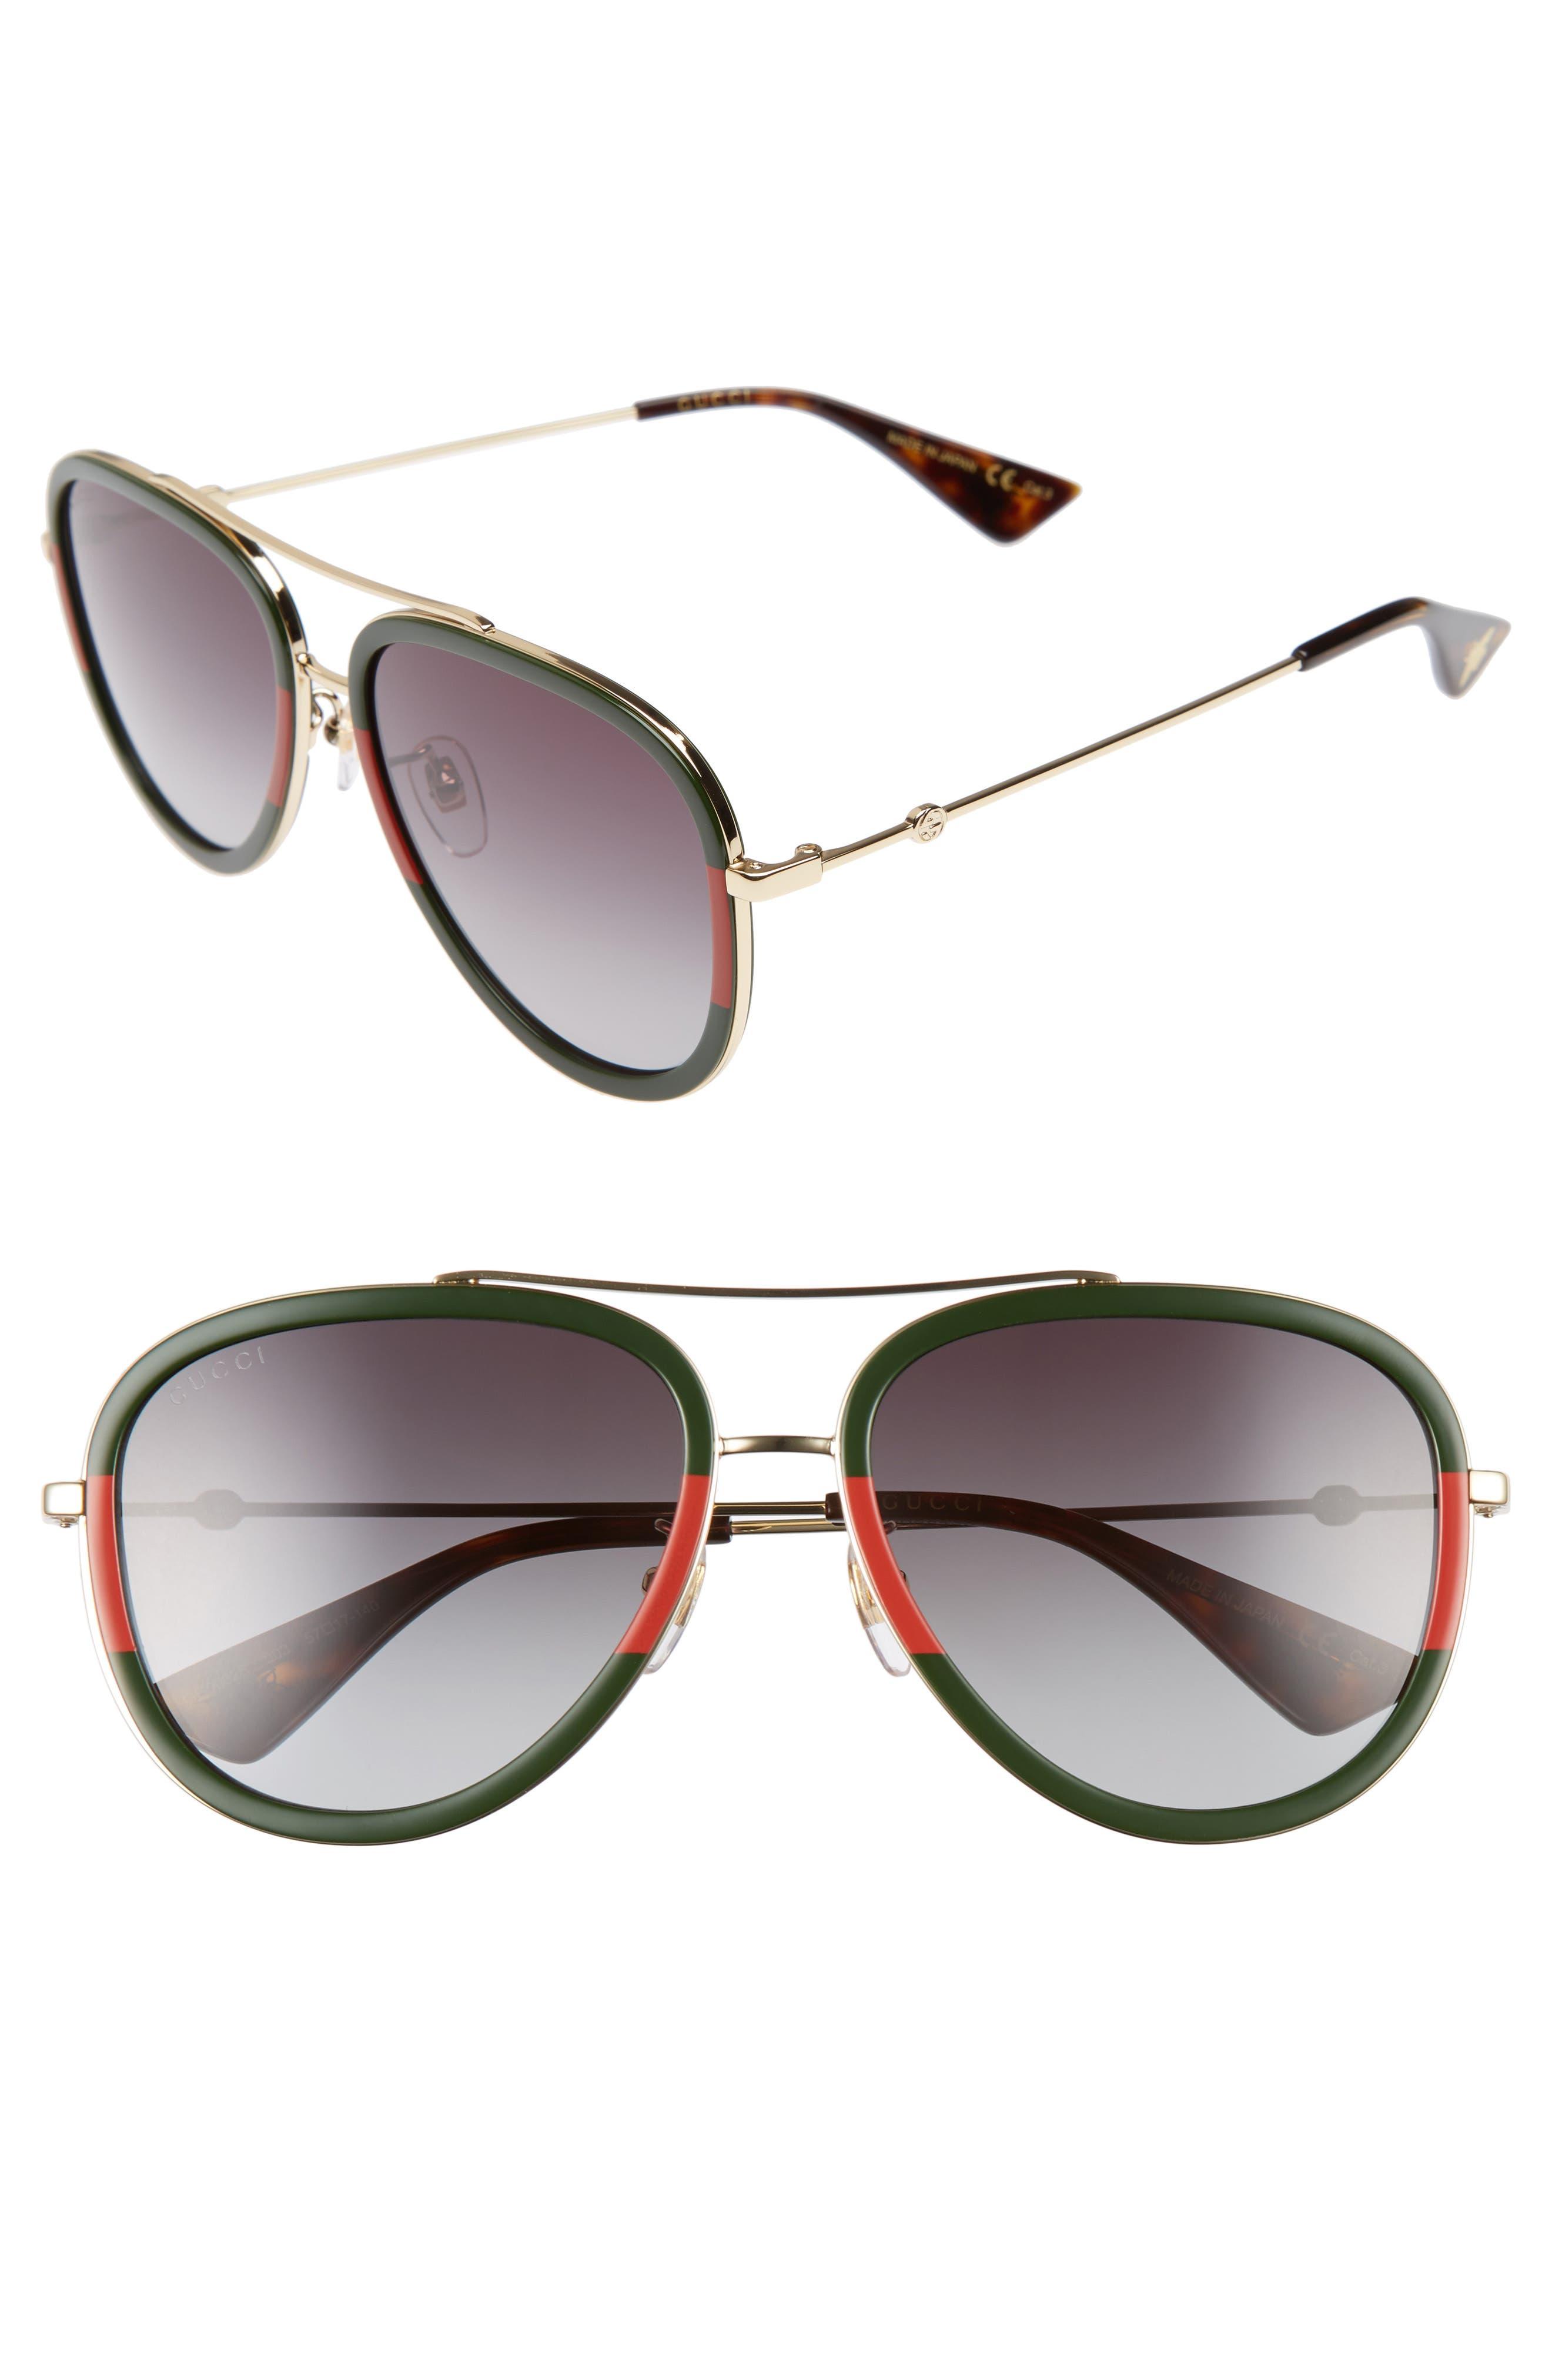 GUCCI, 57mm Aivator Sunglasses, Main thumbnail 1, color, MEDIUM GOLD